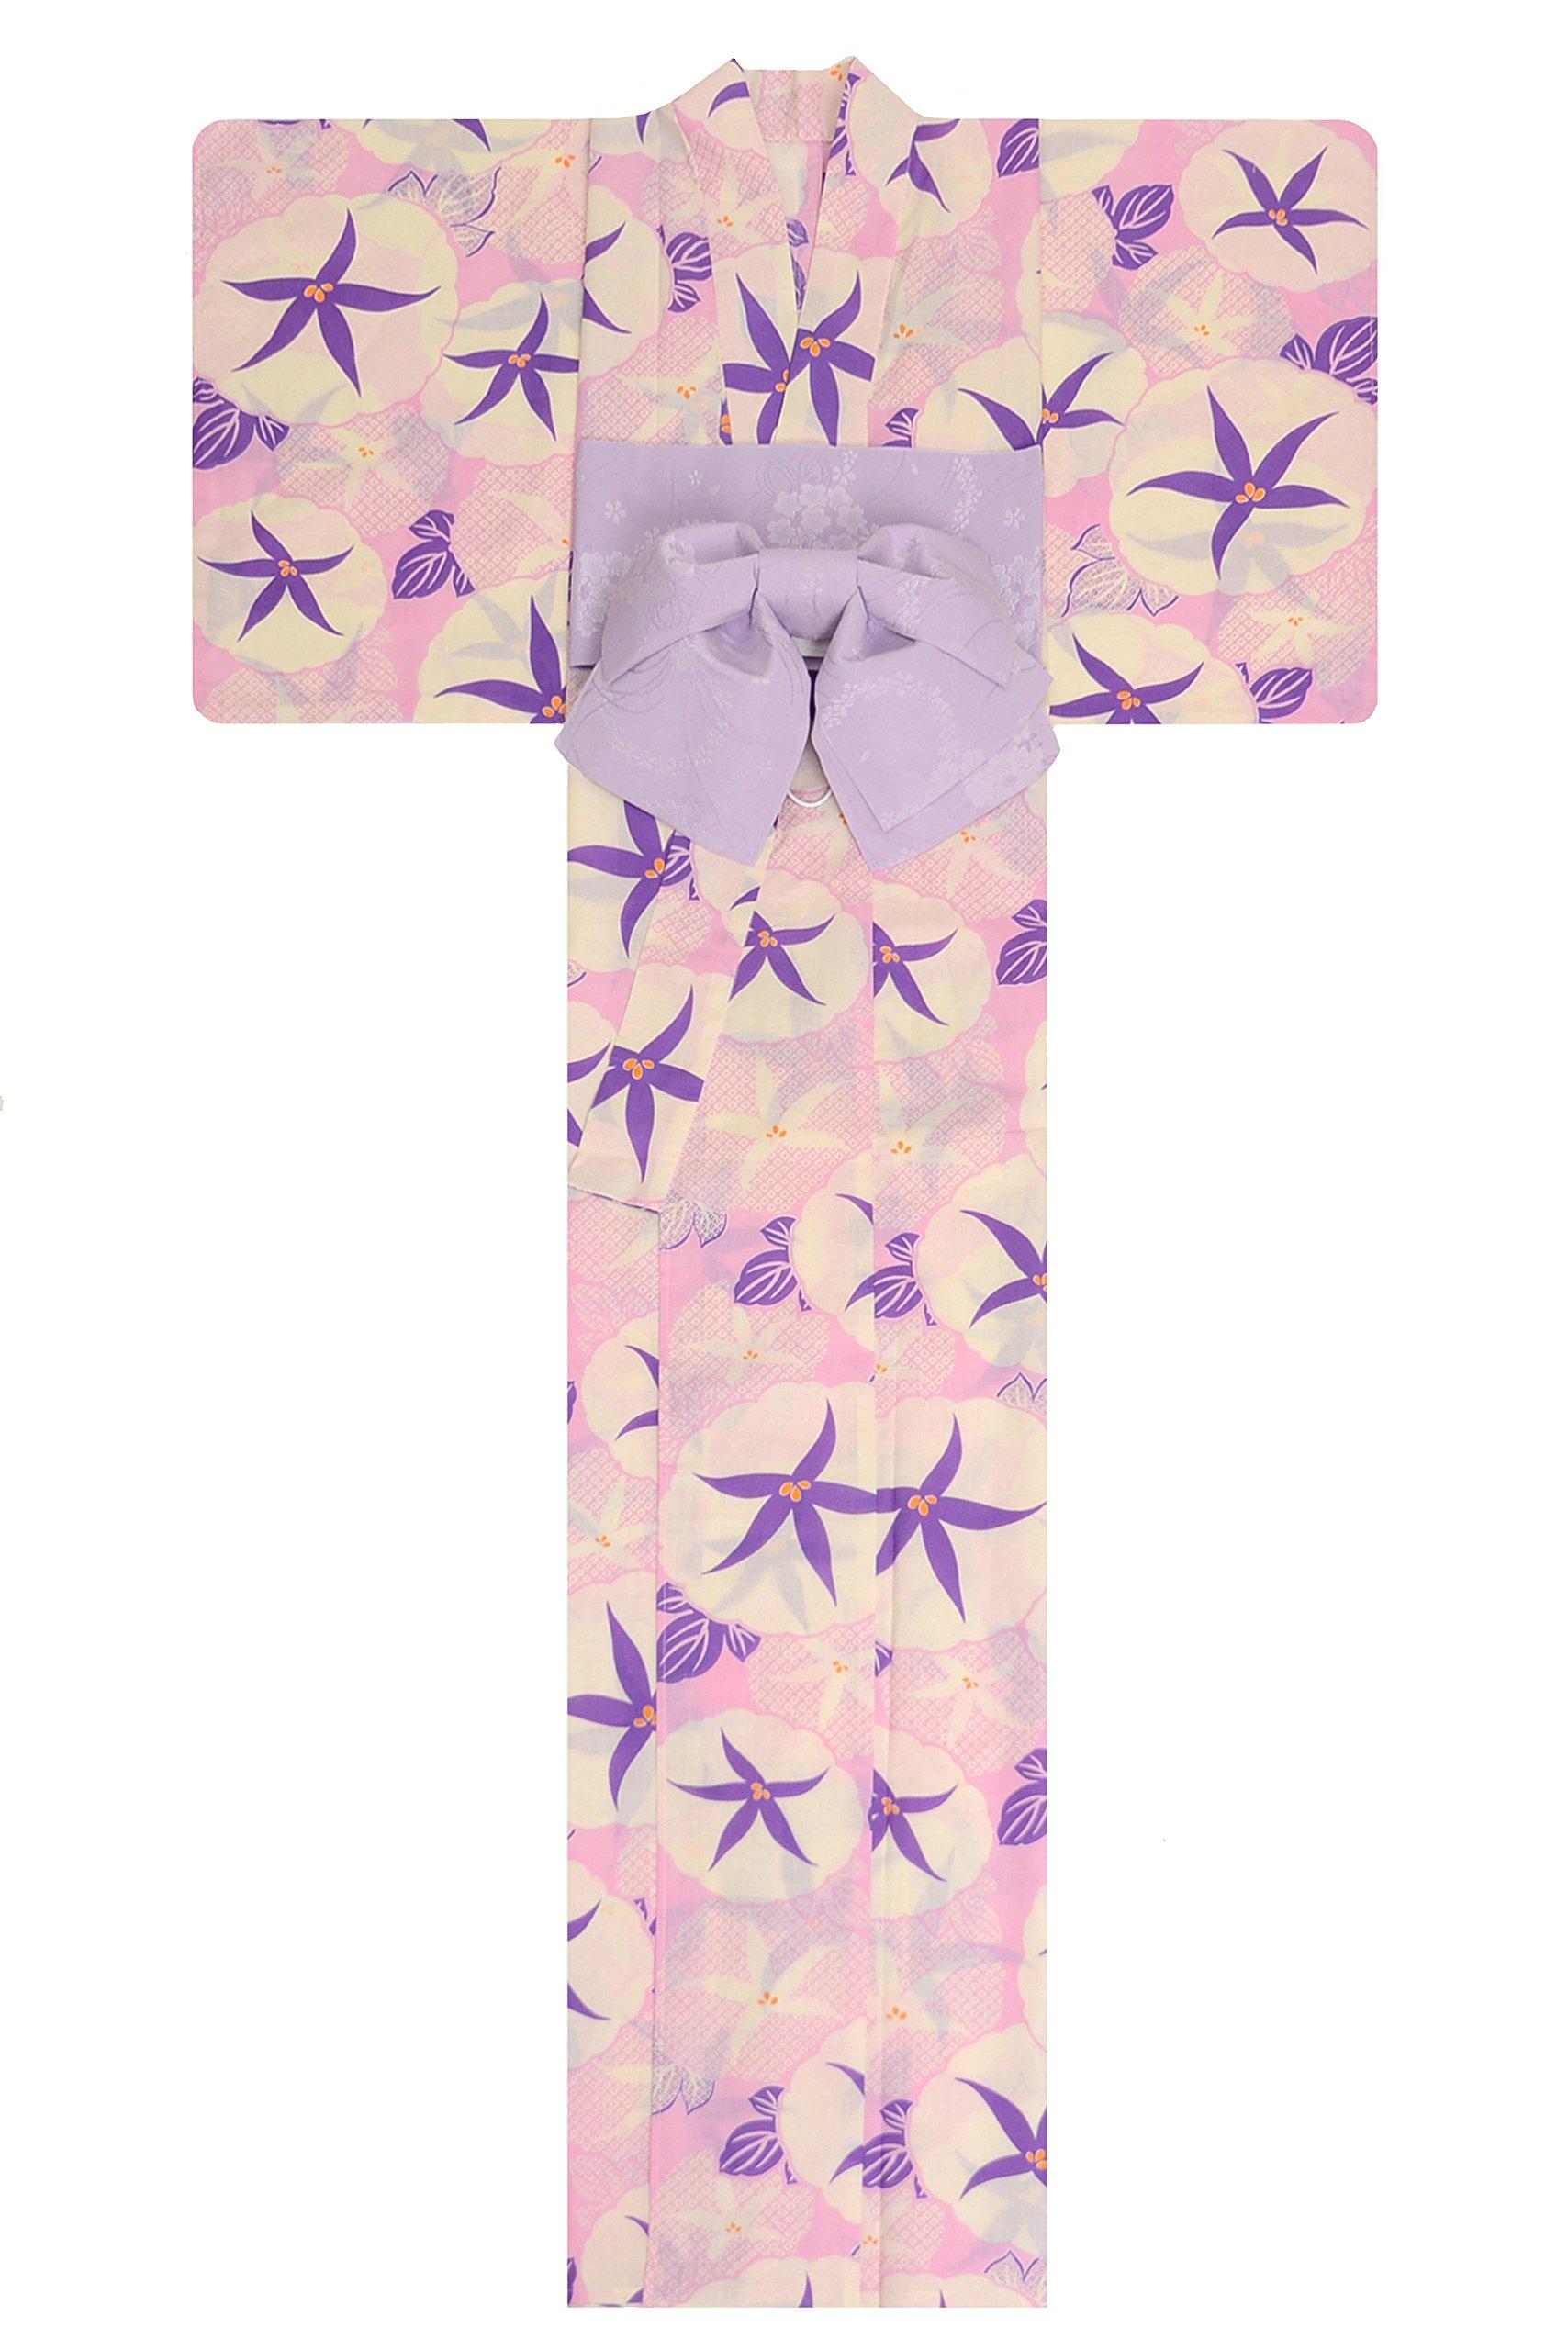 KimonoMode24 Women's Japanese Yukata And Easy Wearing Purple Obi Set/ Flower Pattern Free Size Purple